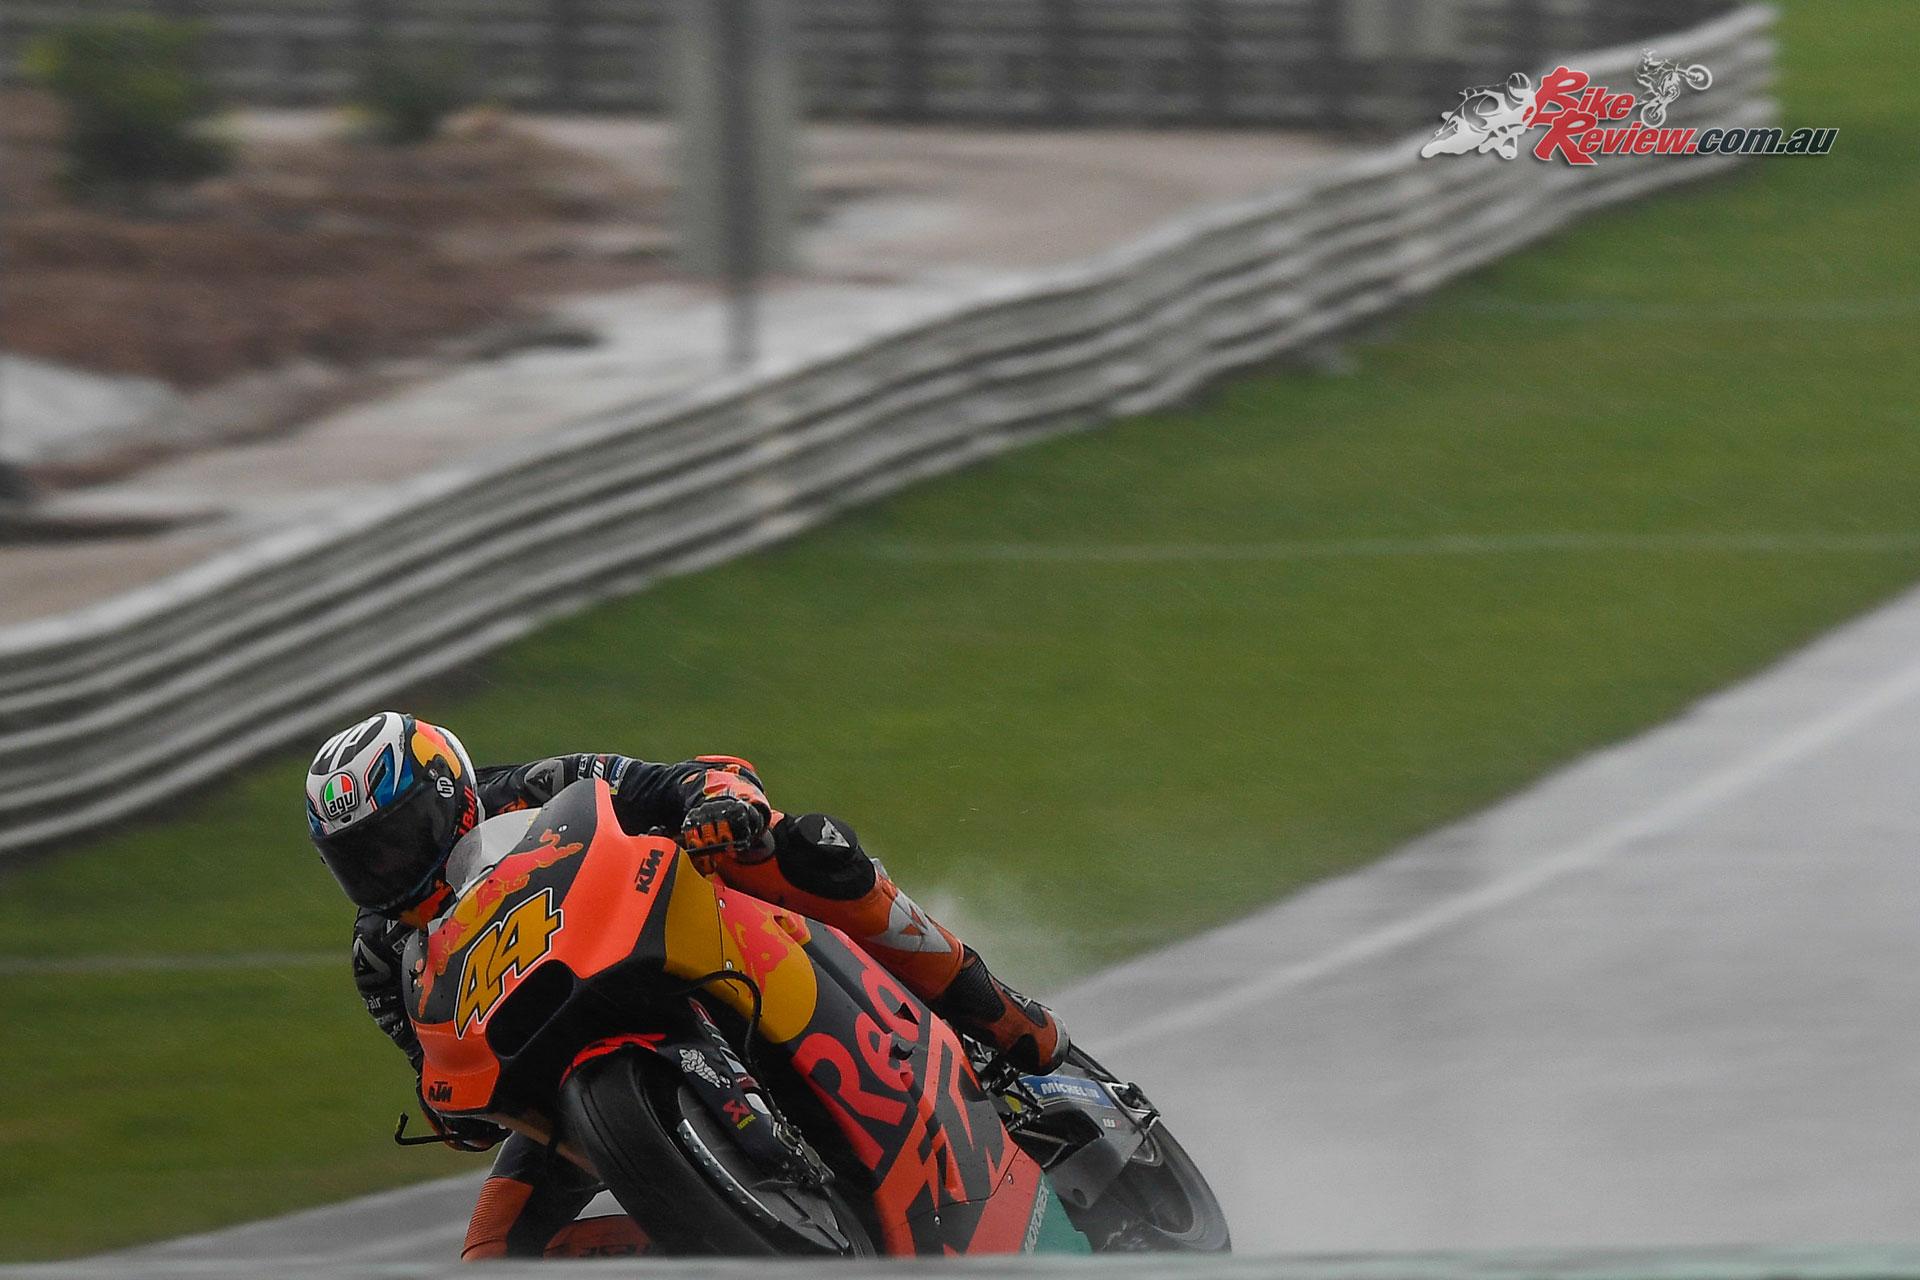 Pol Espargaro - 2018 MotoGP Valencia